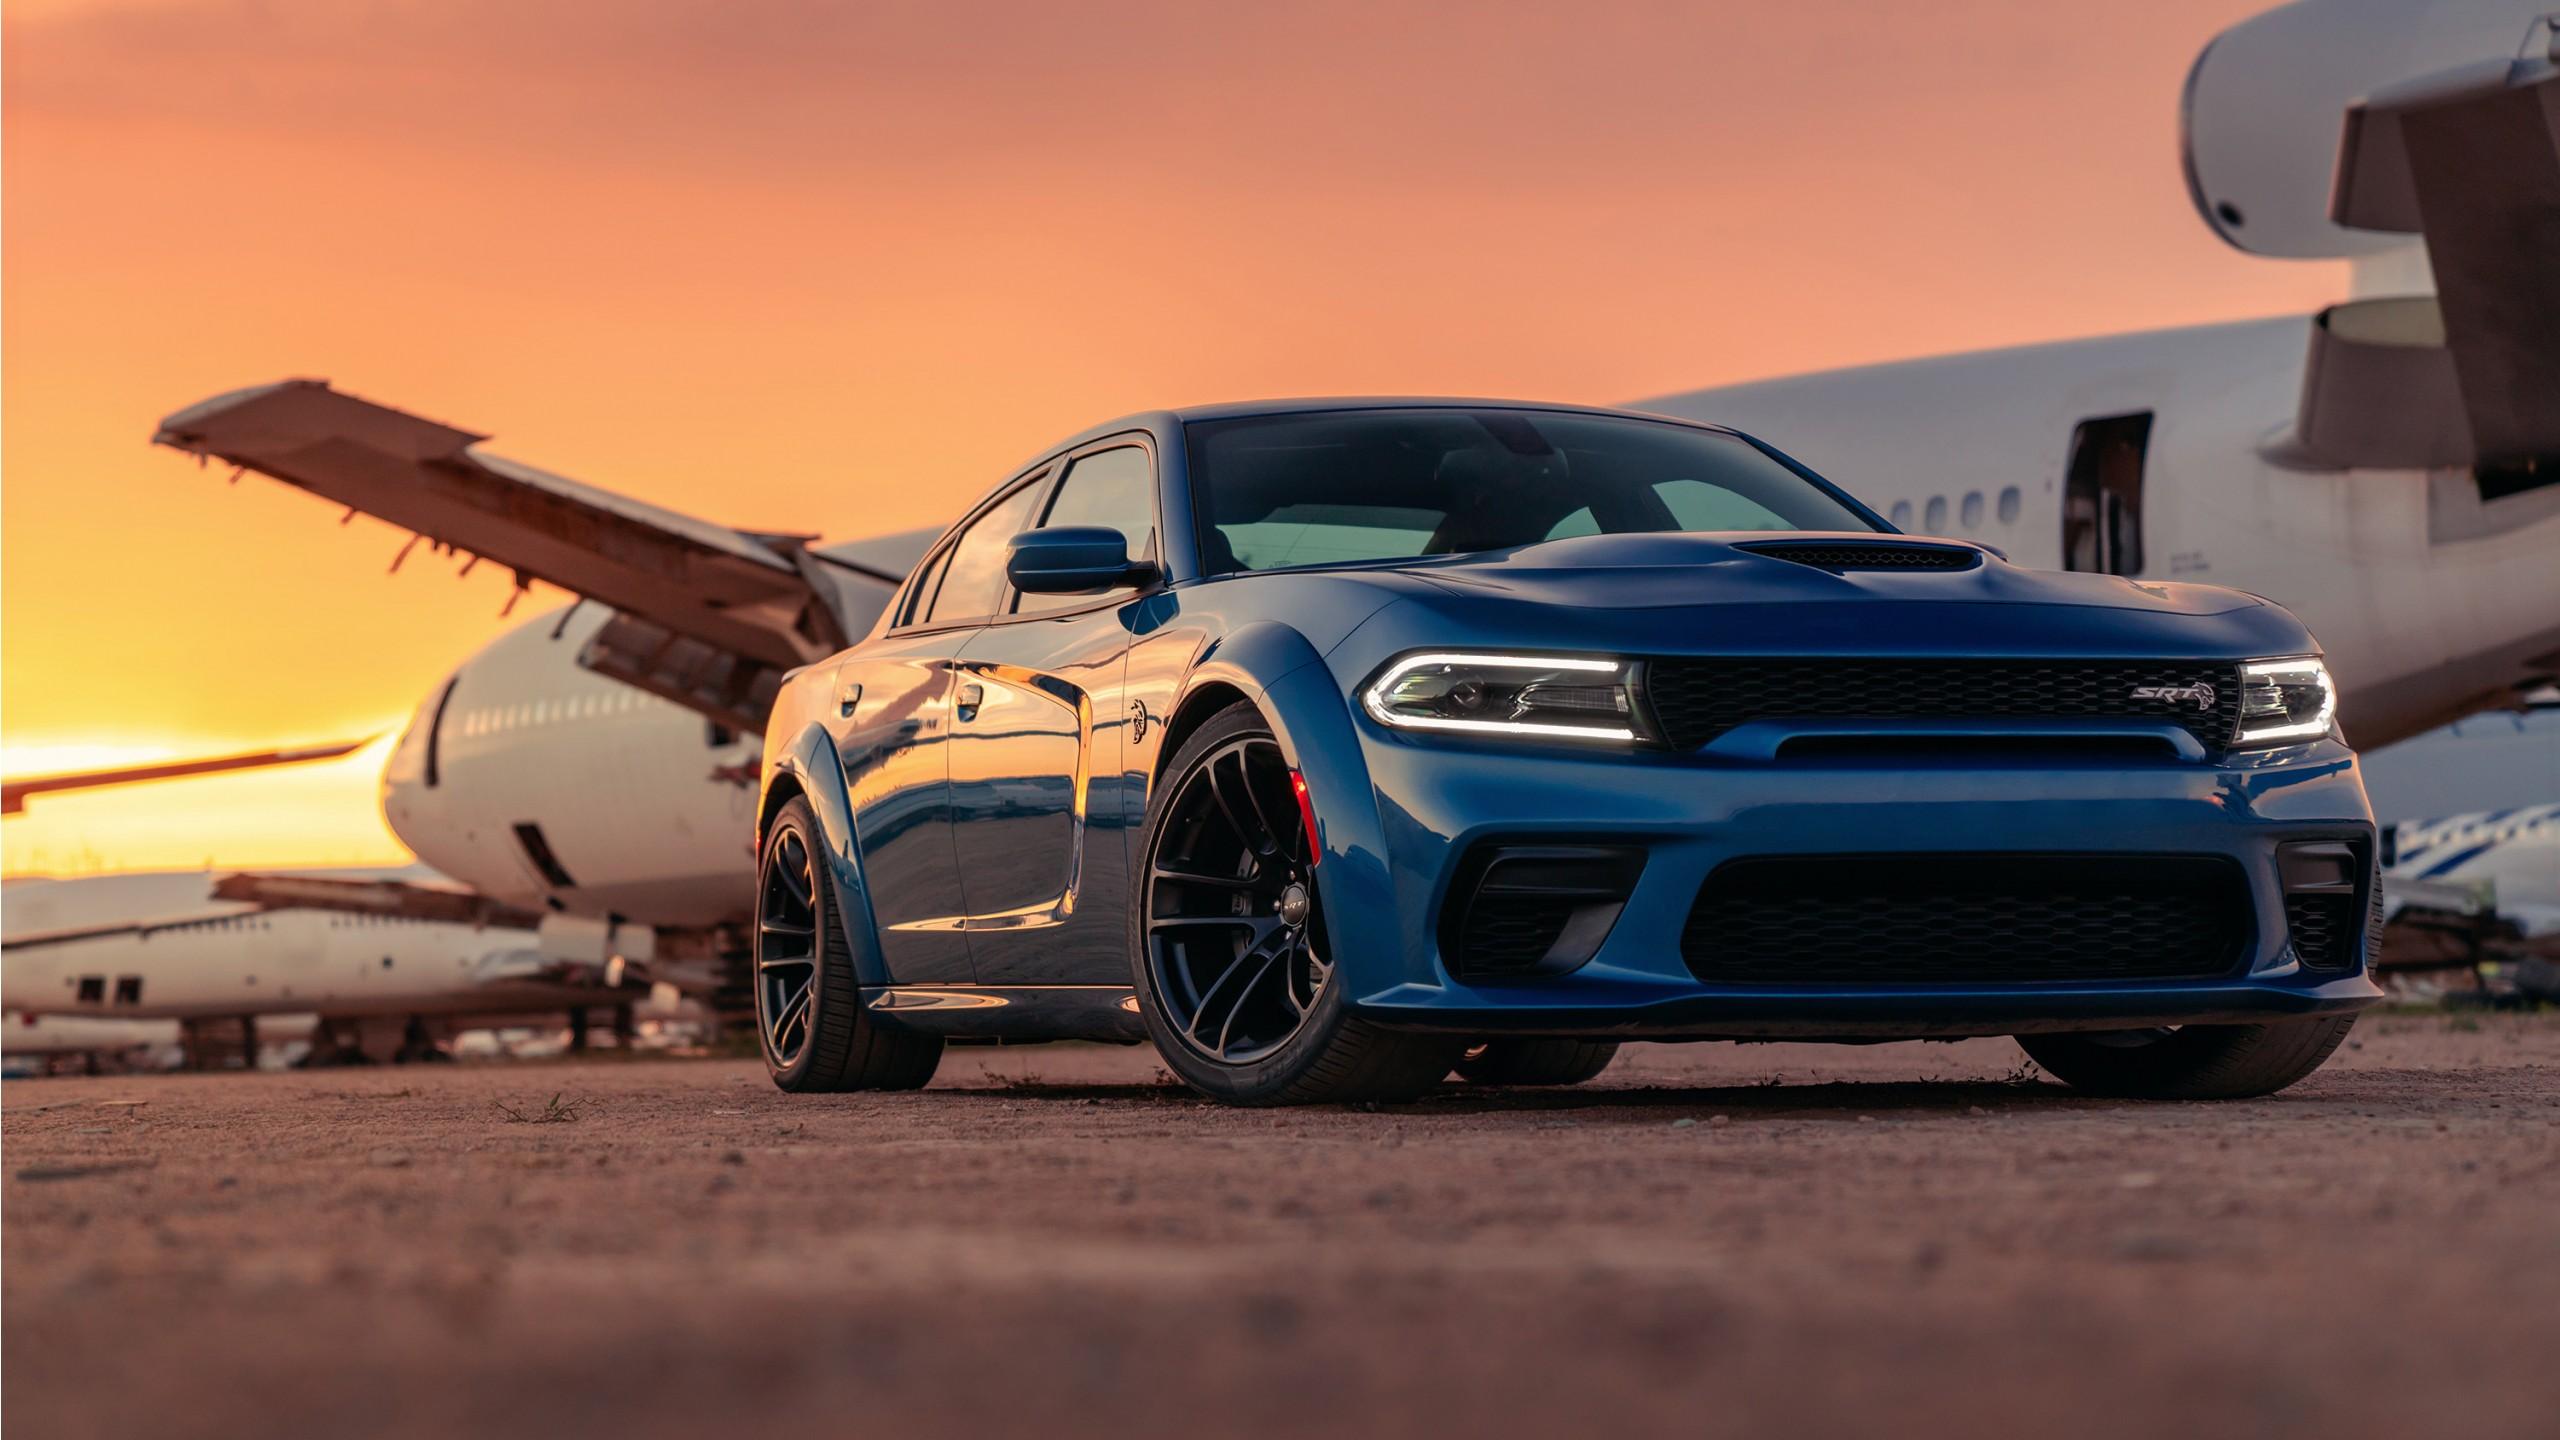 2020 Dodge Charger Srt Hellcat Widebody Wallpaper Hd Car